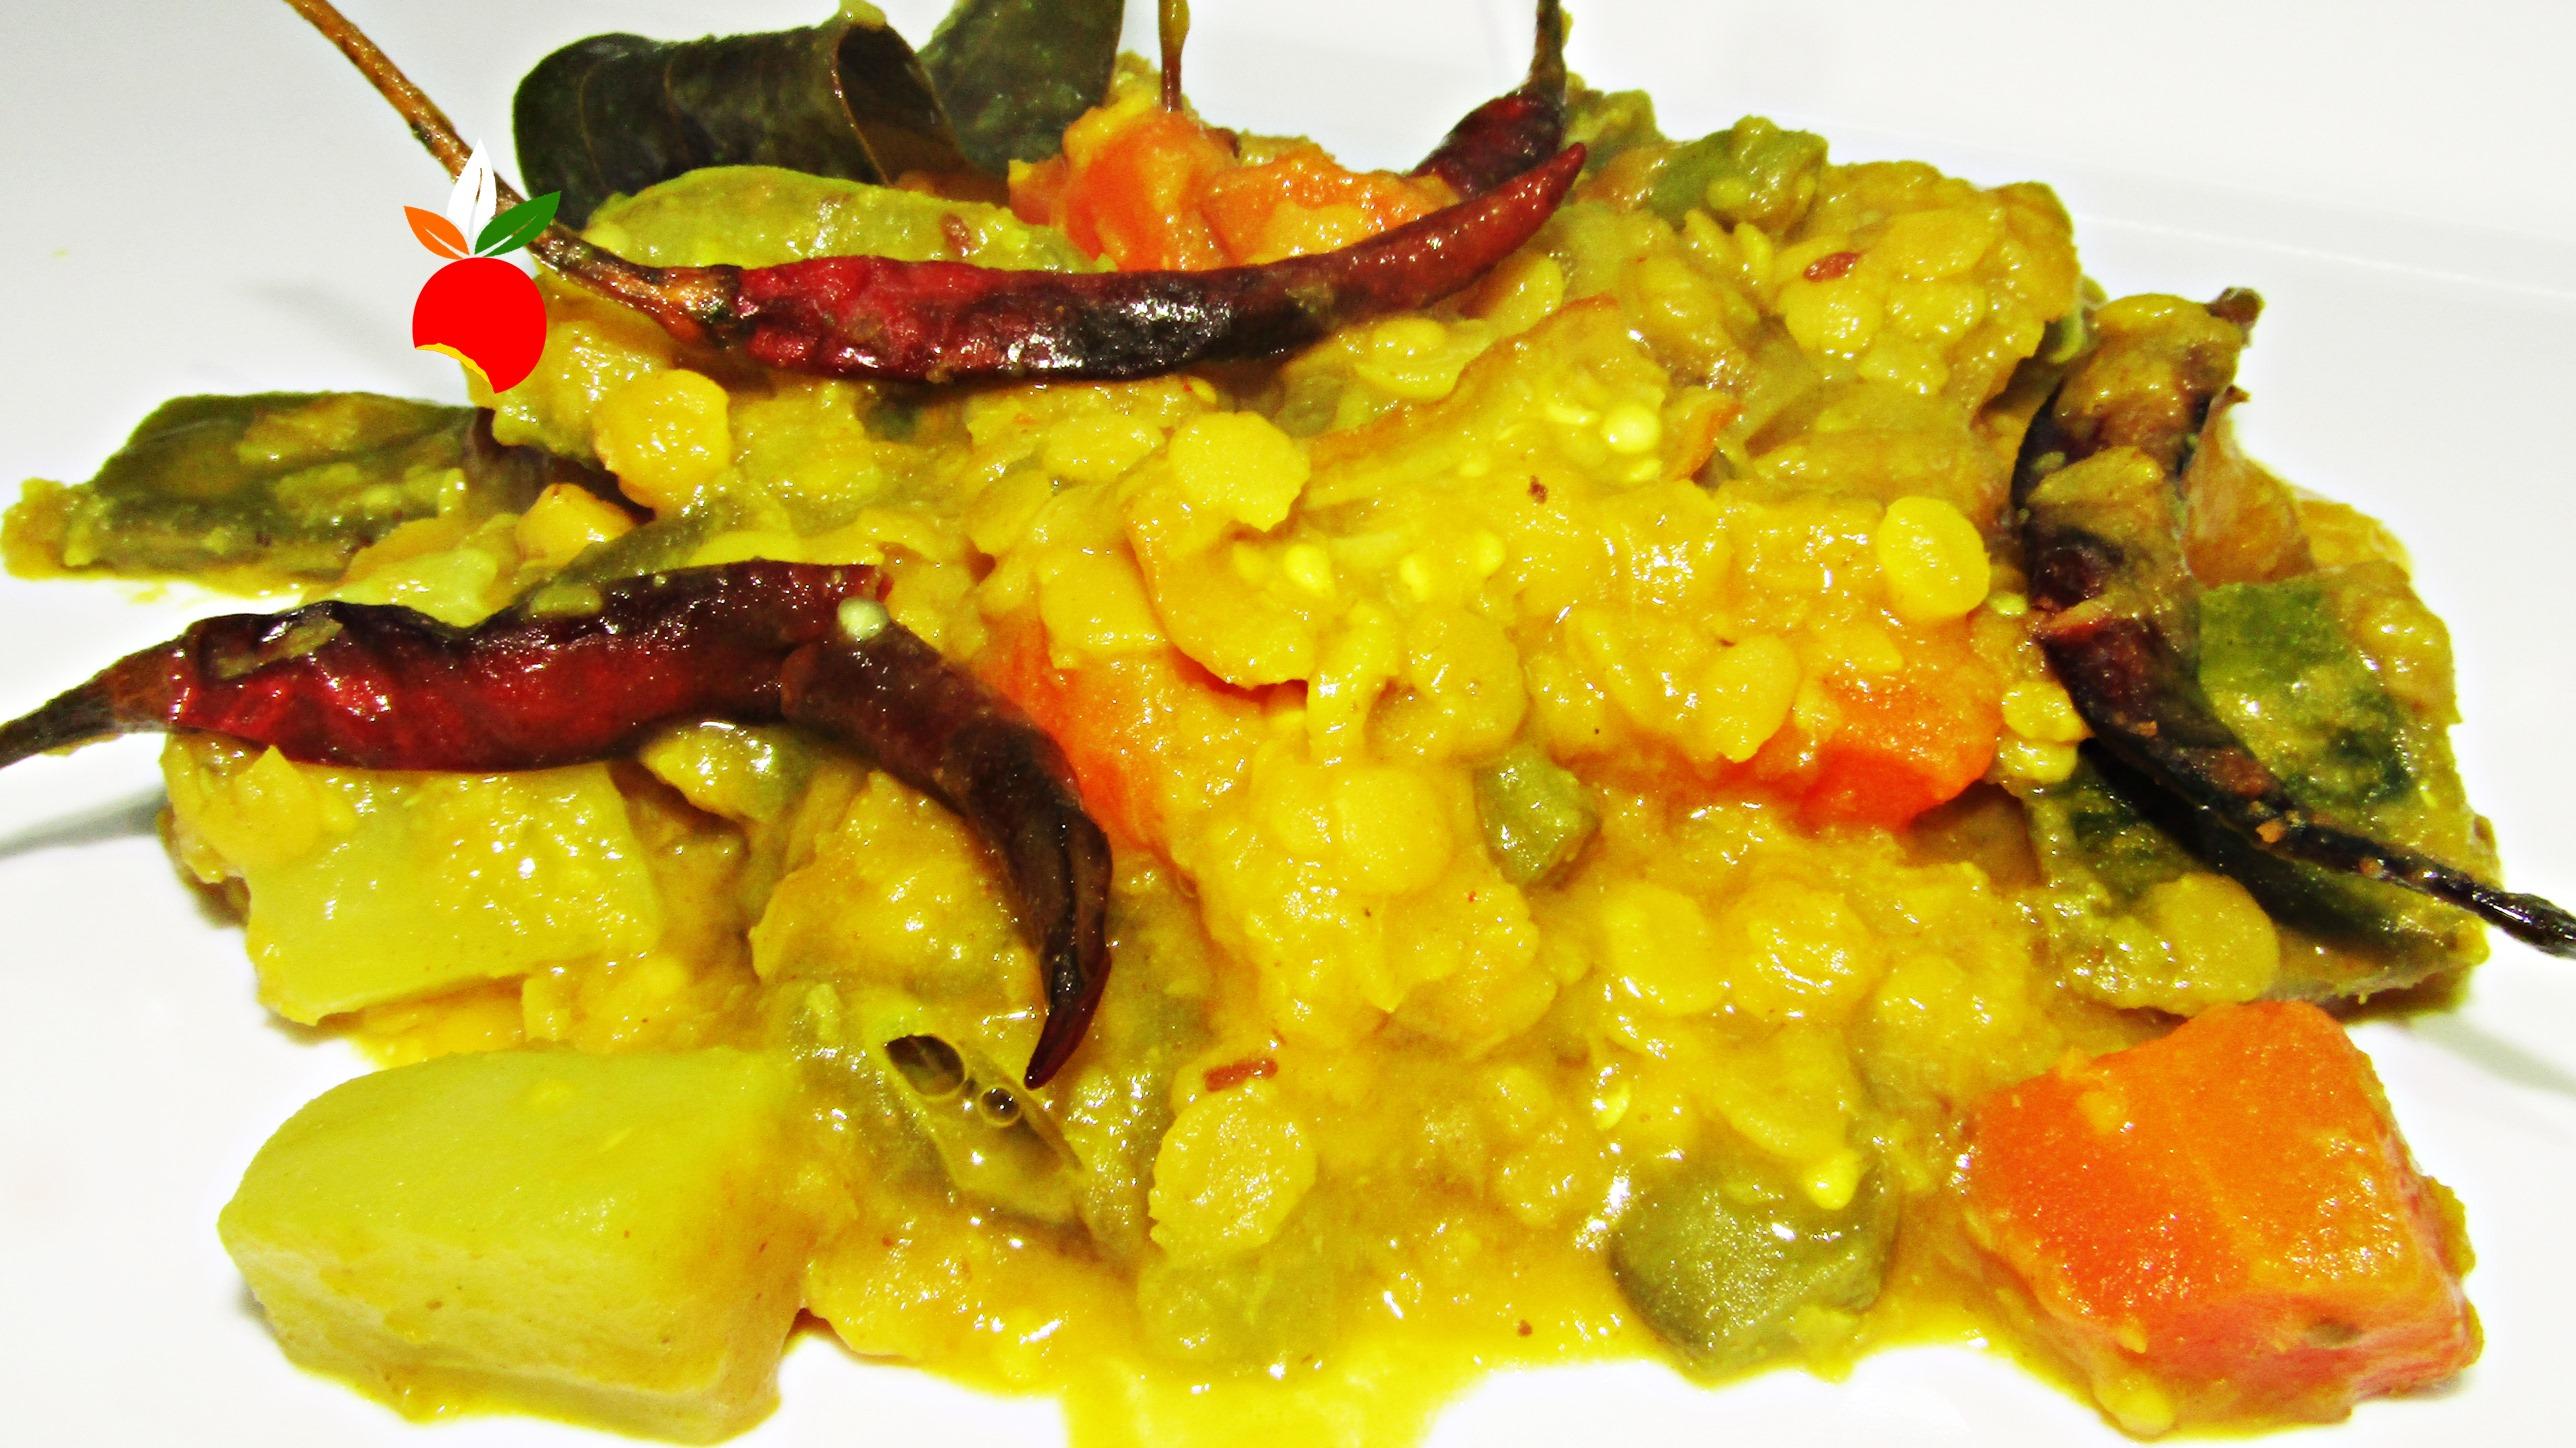 Dalma from Odisha, India | Best Indian Food Blog | Pulse Vegetable recipe